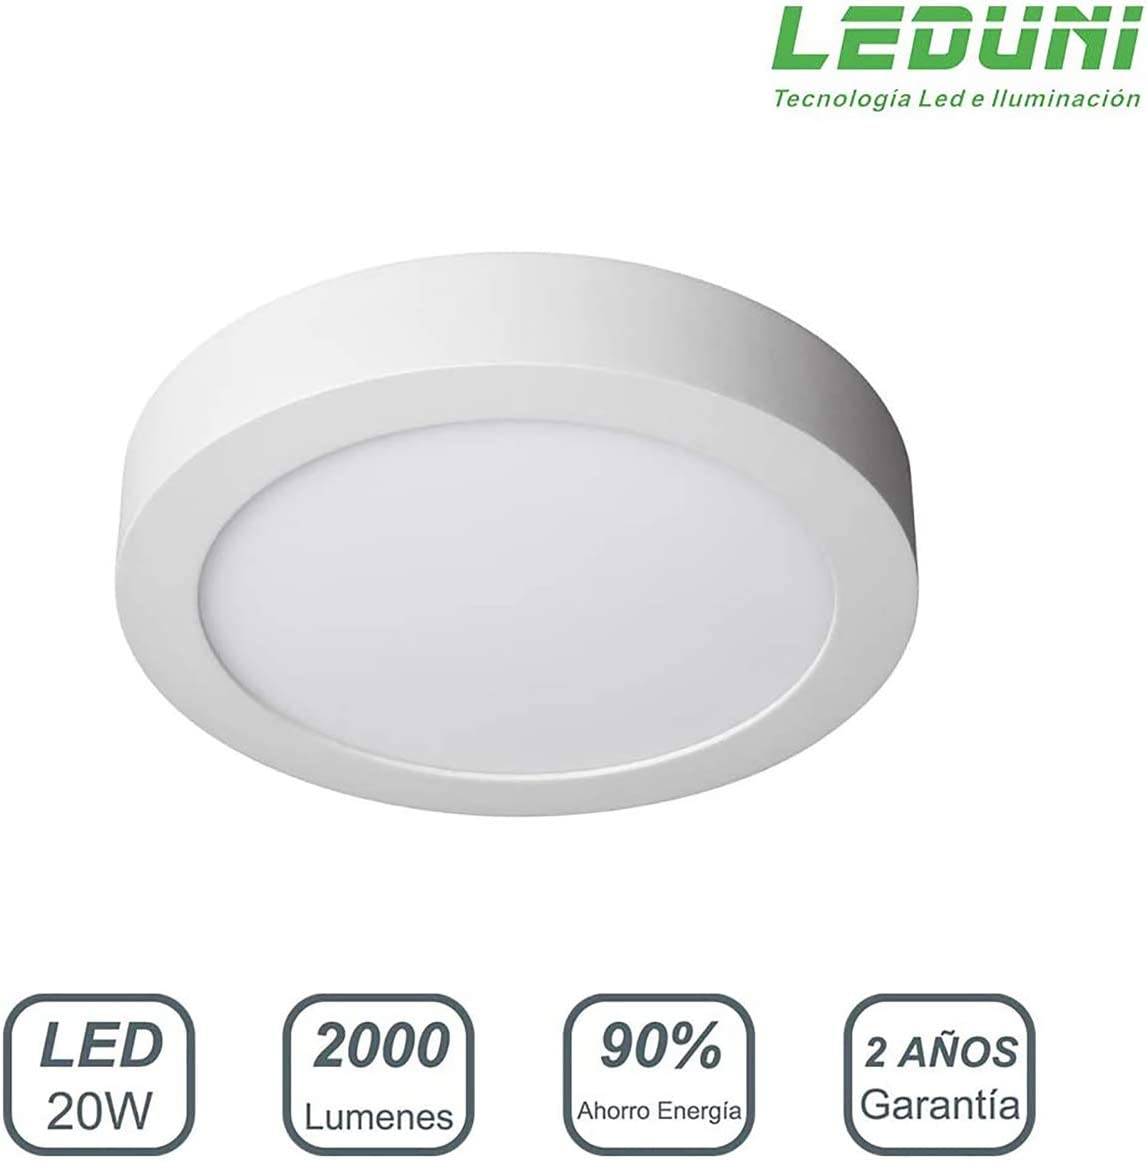 LEDUNI Downlight Panel Superficie LED Circular Redonda 20W 2000LM Plafon Redondo Para techo y Pared Color Blanco Frío 6000K Angulo 120 IP40 OPAL Aluminio 225 * 40Hmm